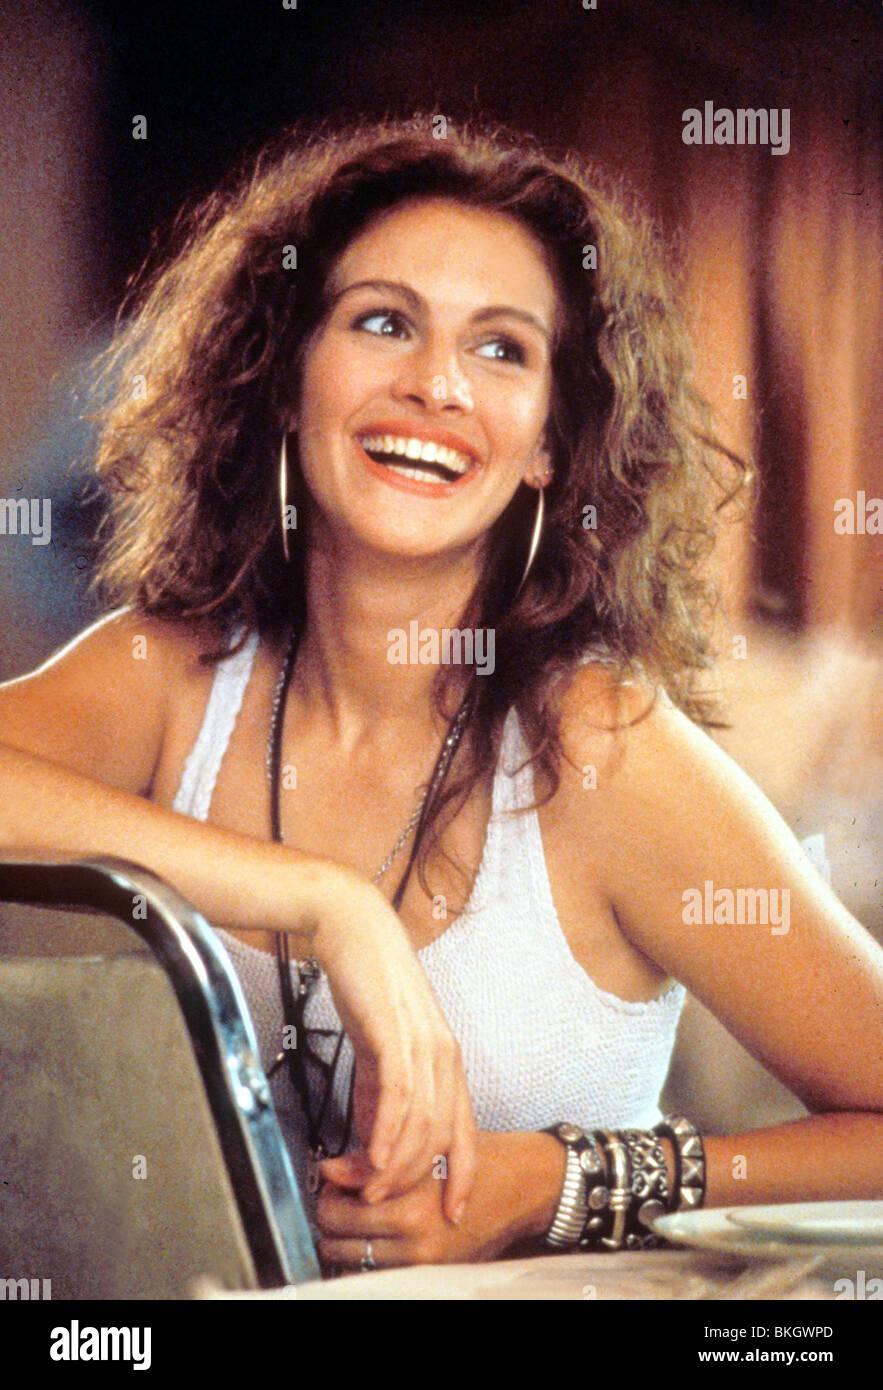 Pretty Woman 1990 Julia Roberts Stock Photo Alamy